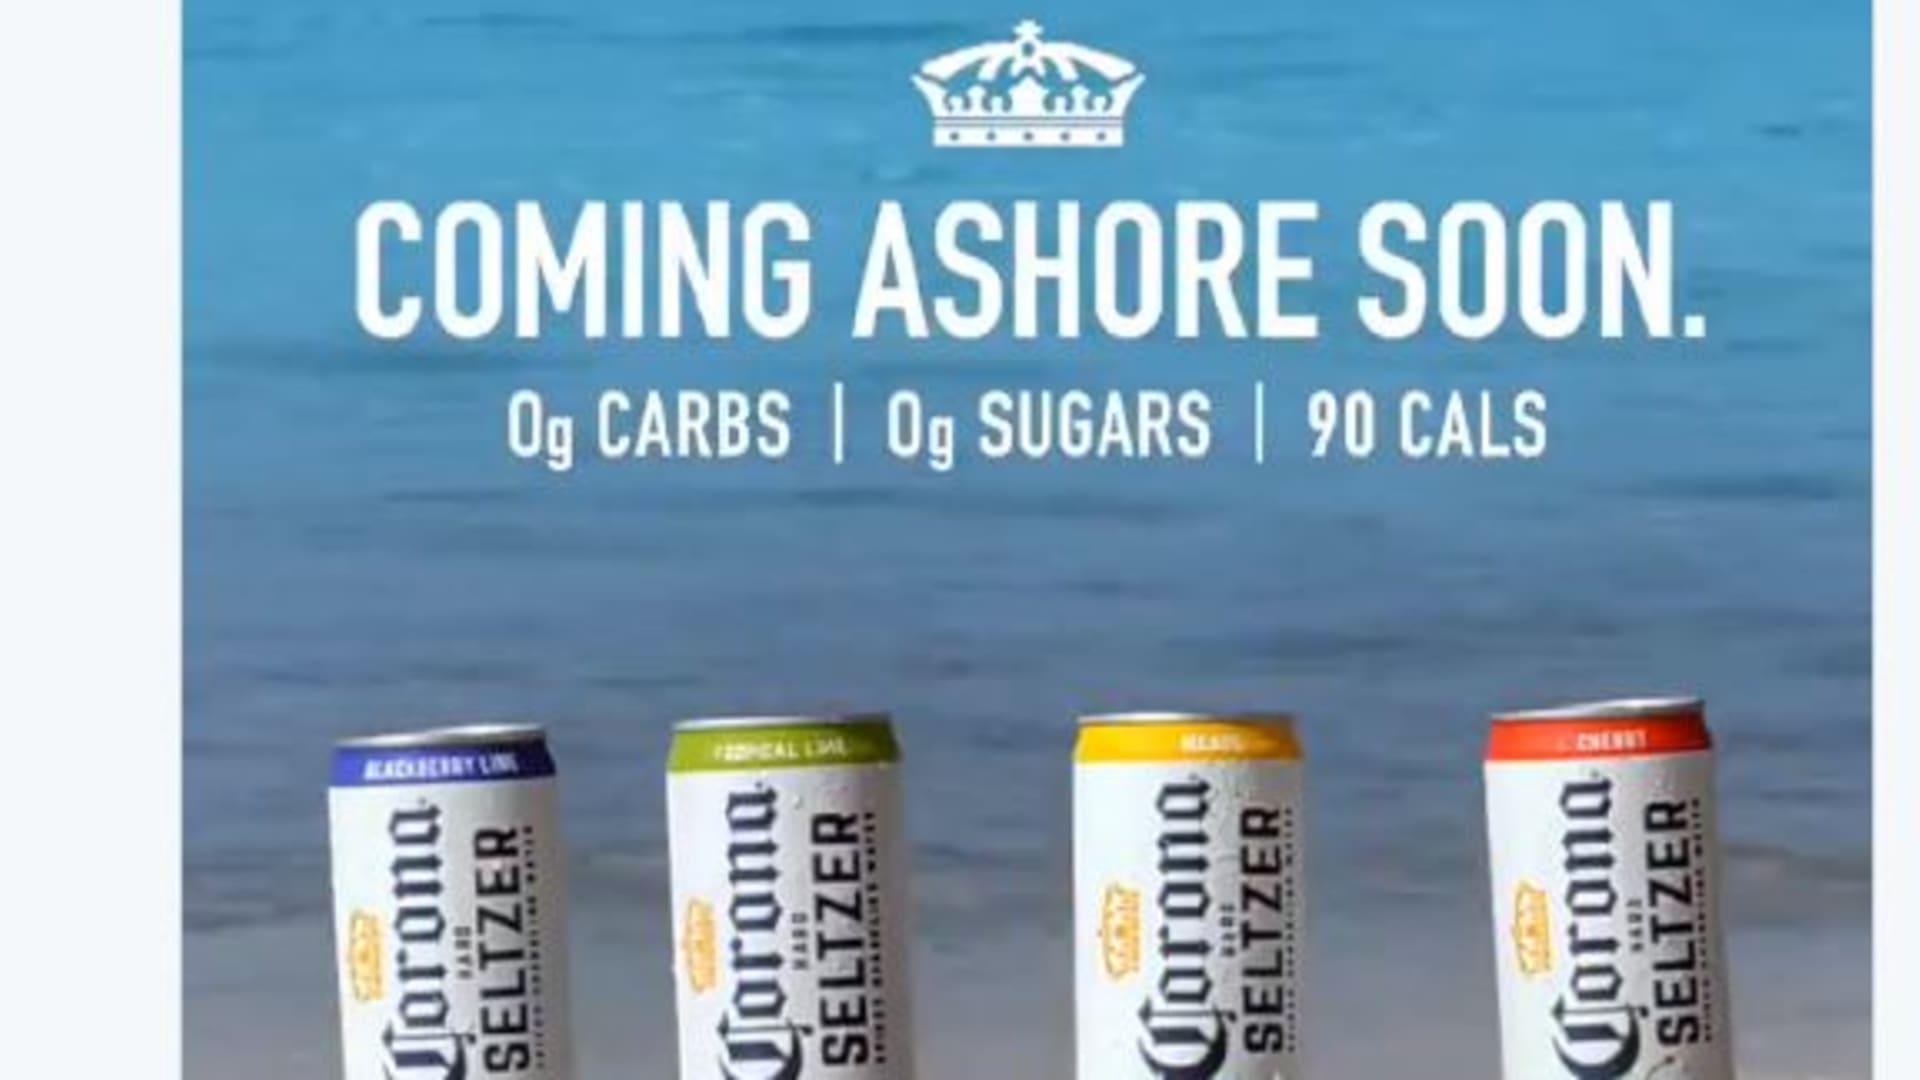 Corona's ad 'Coming Ashore Soon.'